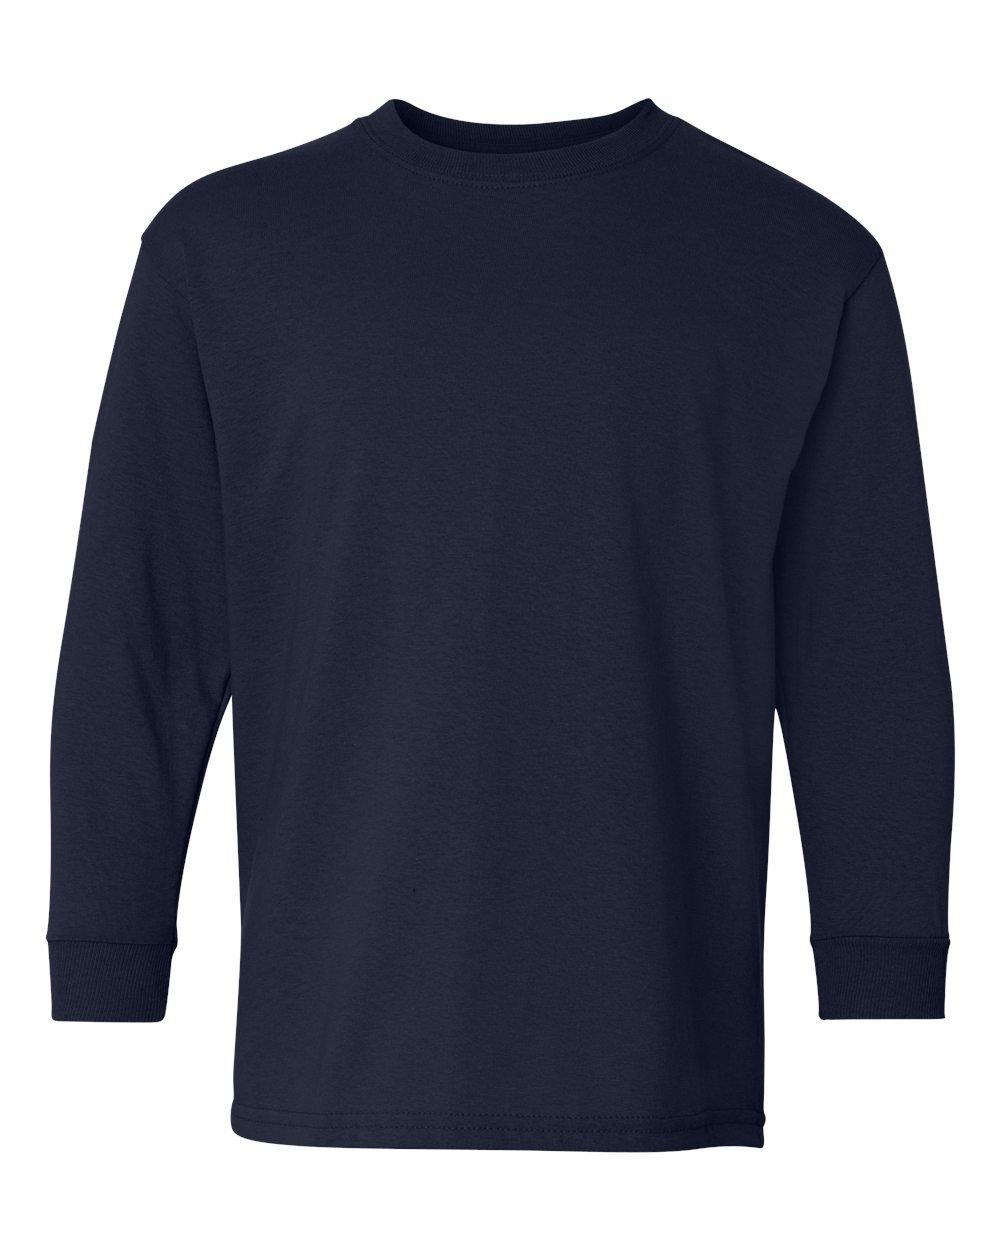 Long Sleeve Shirts - US Availability